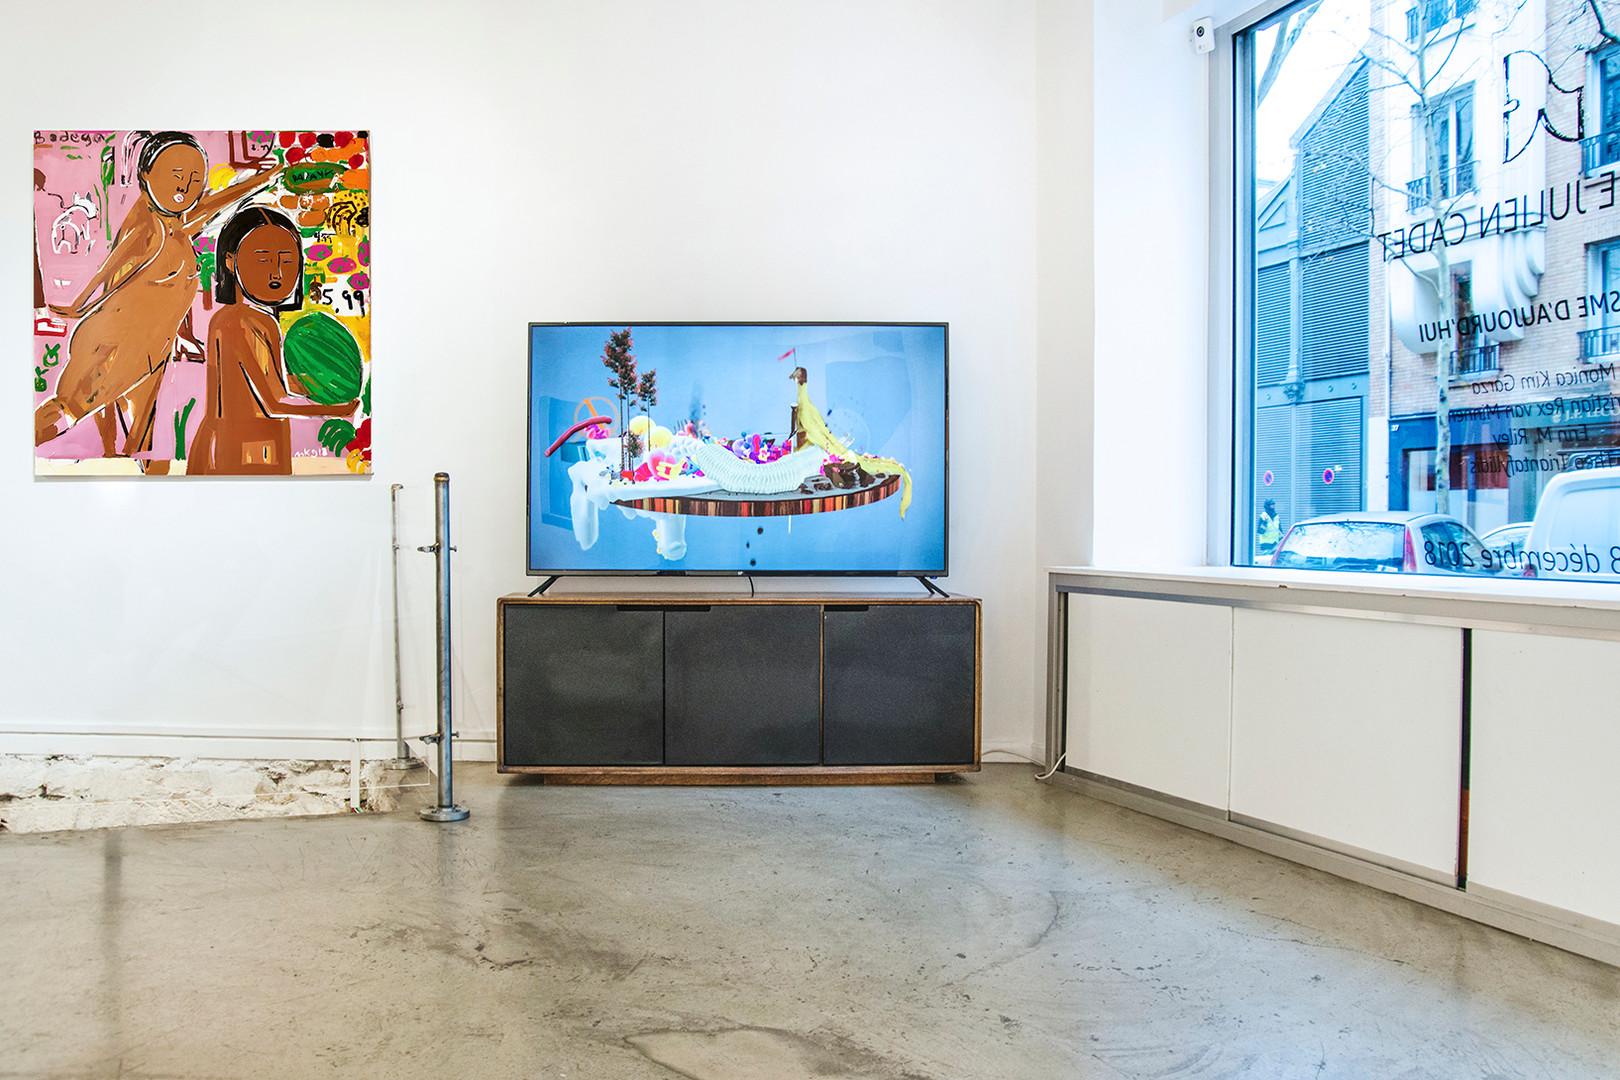 Galerie Julien Cadet Monica Kim Garza, Theo Triantafyllidis Réalisme d'aujourd'hui